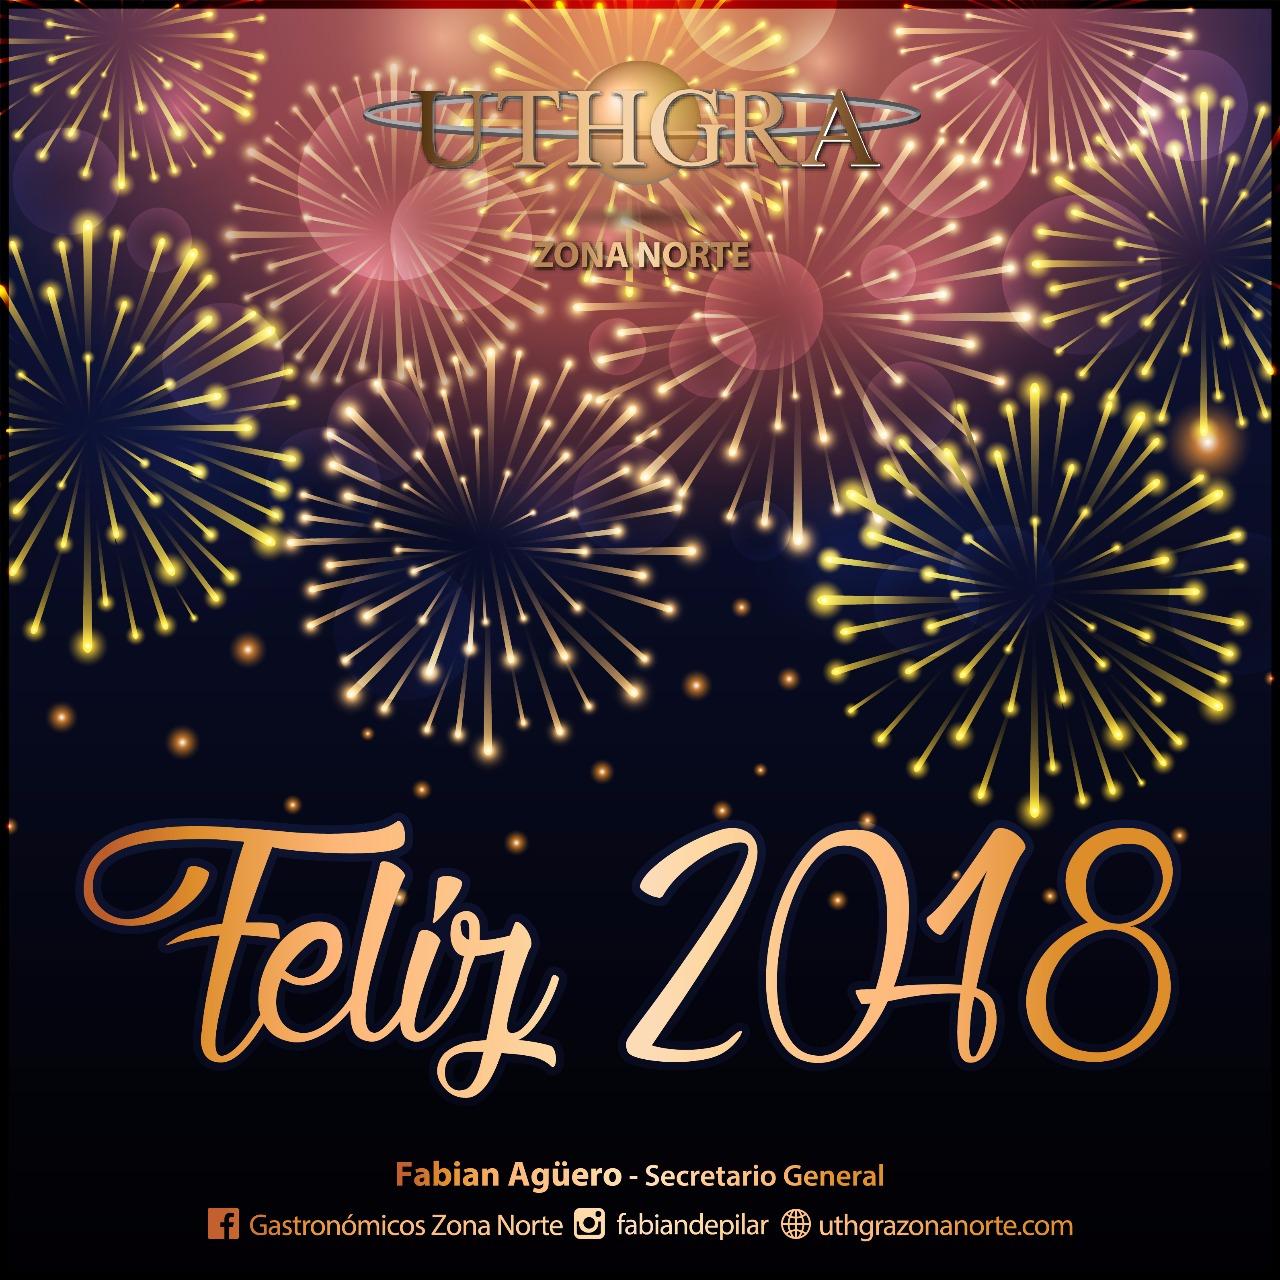 FELIZ 2018 COMPAñEROS!